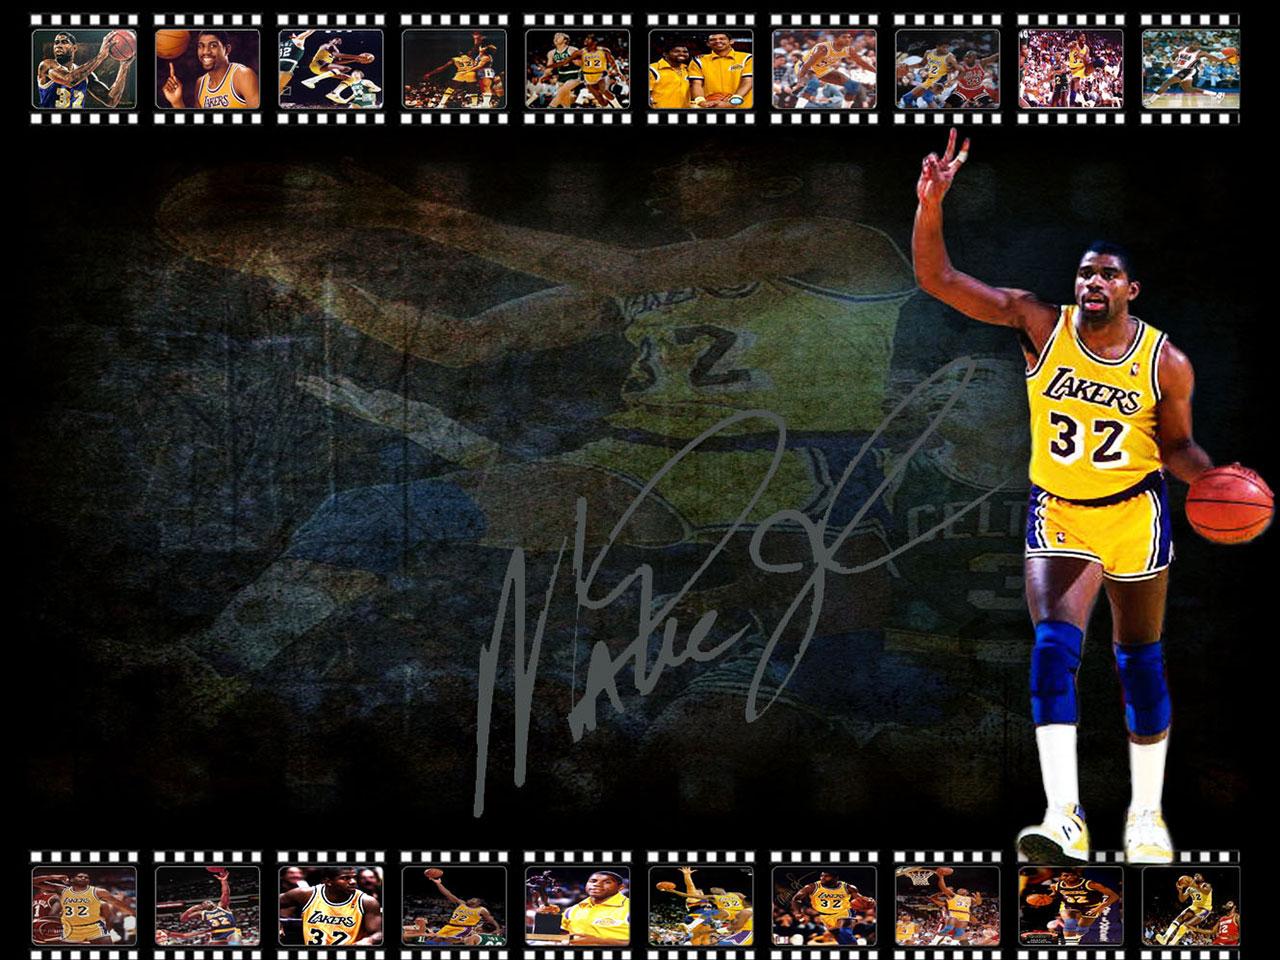 Magic Johnson wallpaper | 1152x864 | #2095